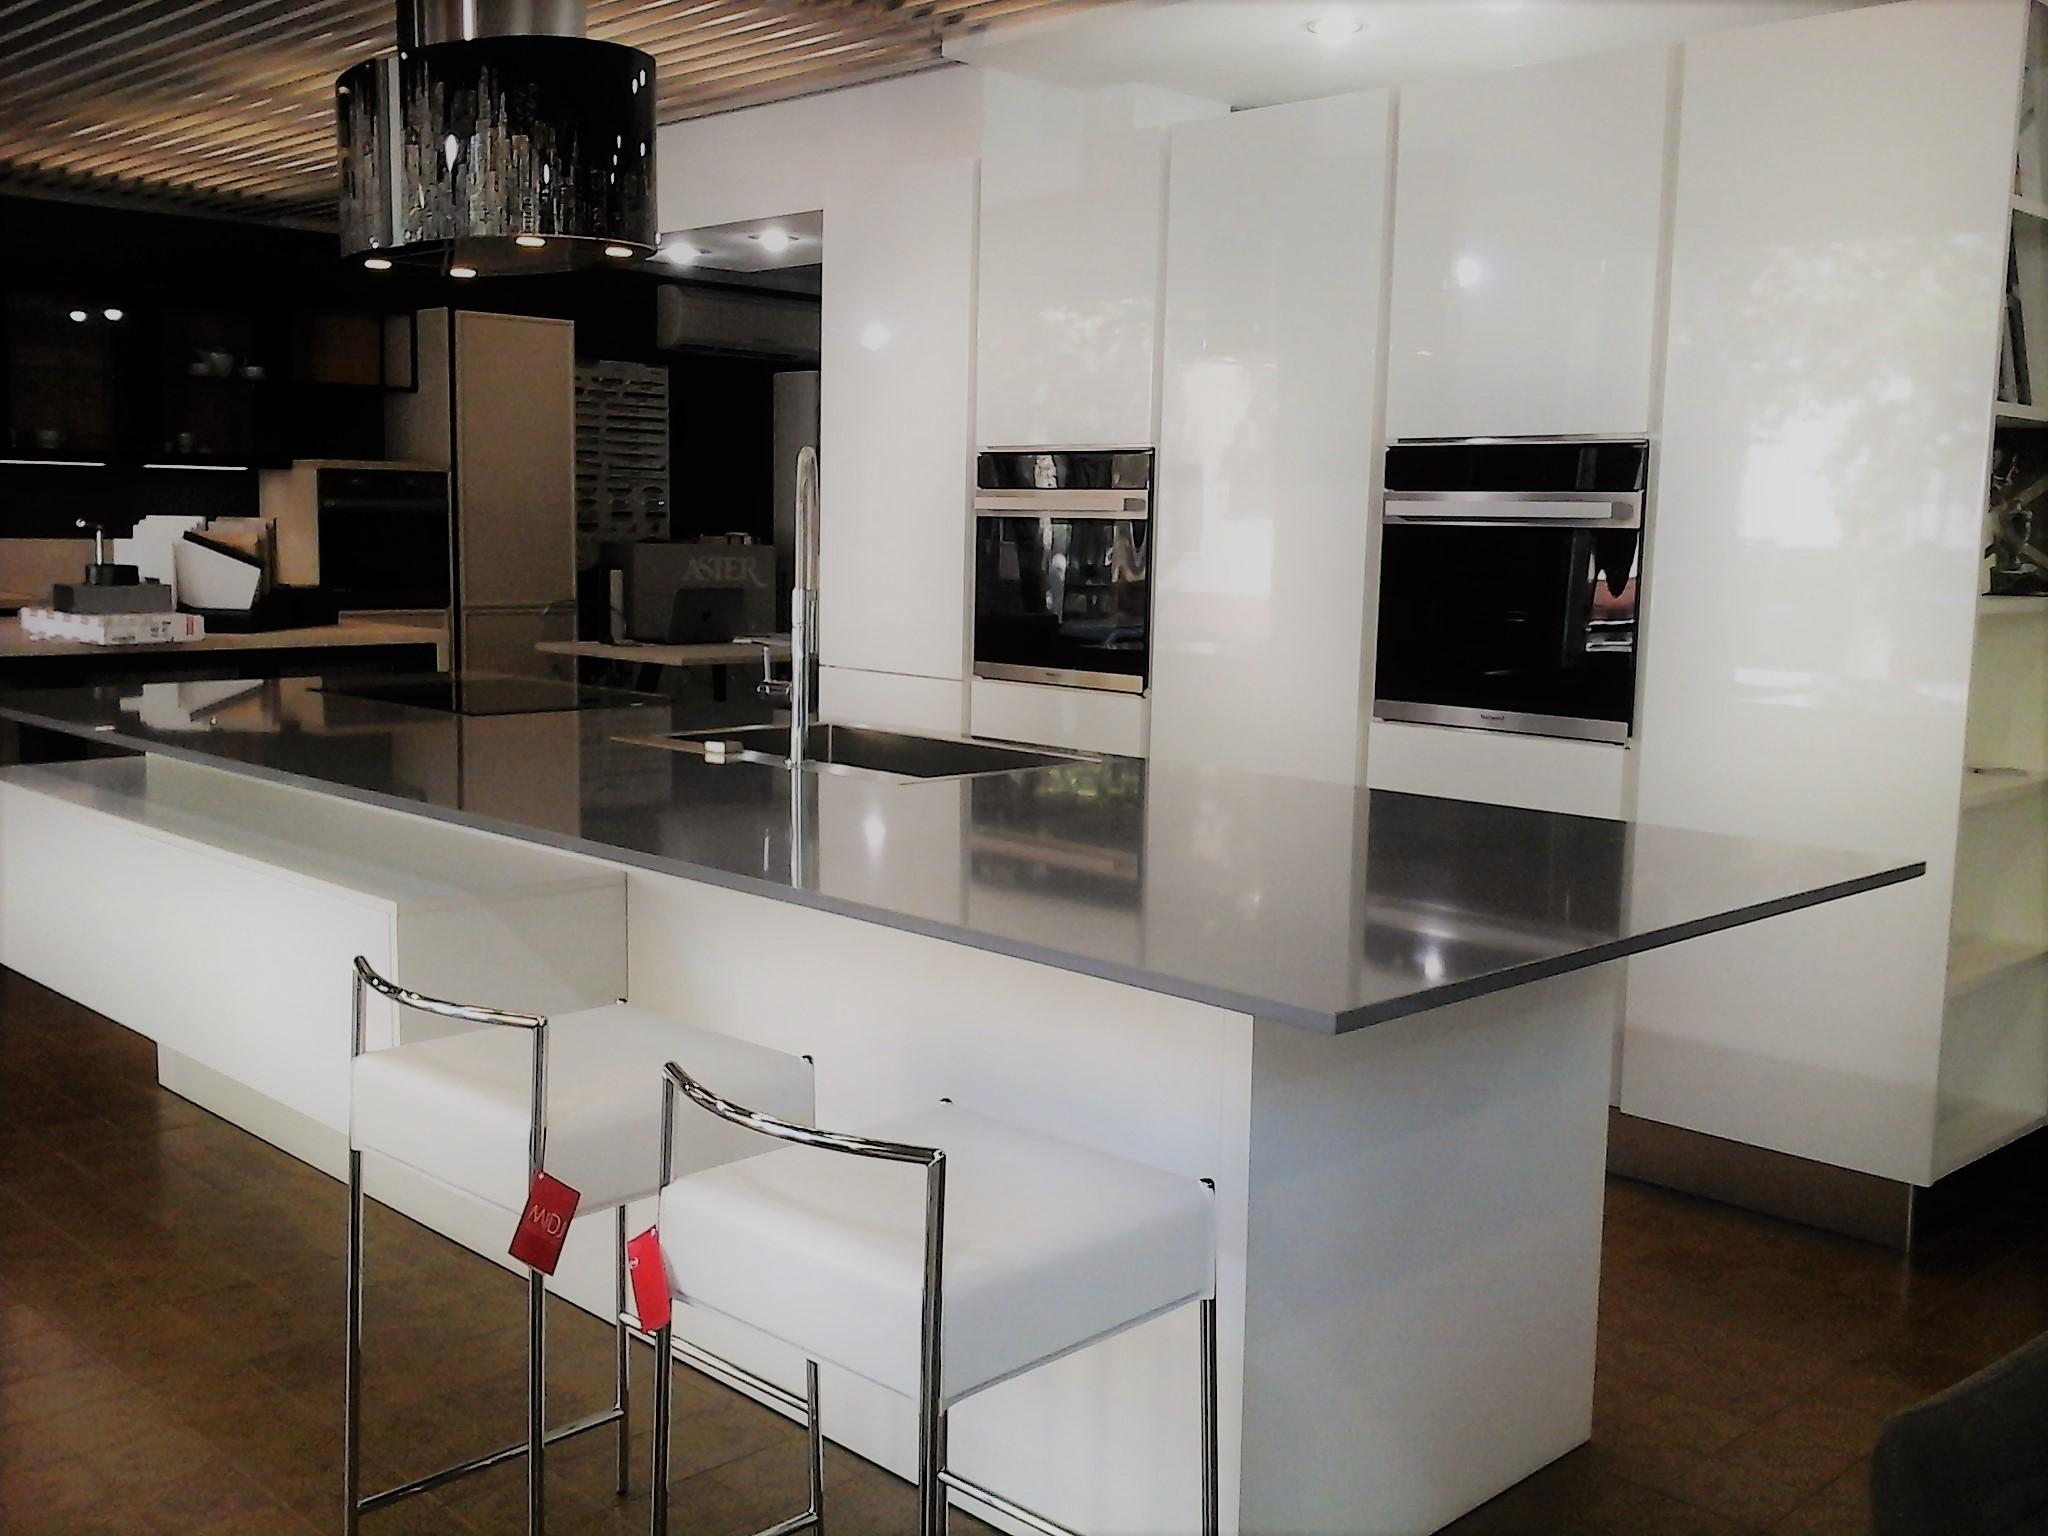 Cucina atra gola polimerico lucido bianco cucine a for Cucina bianca